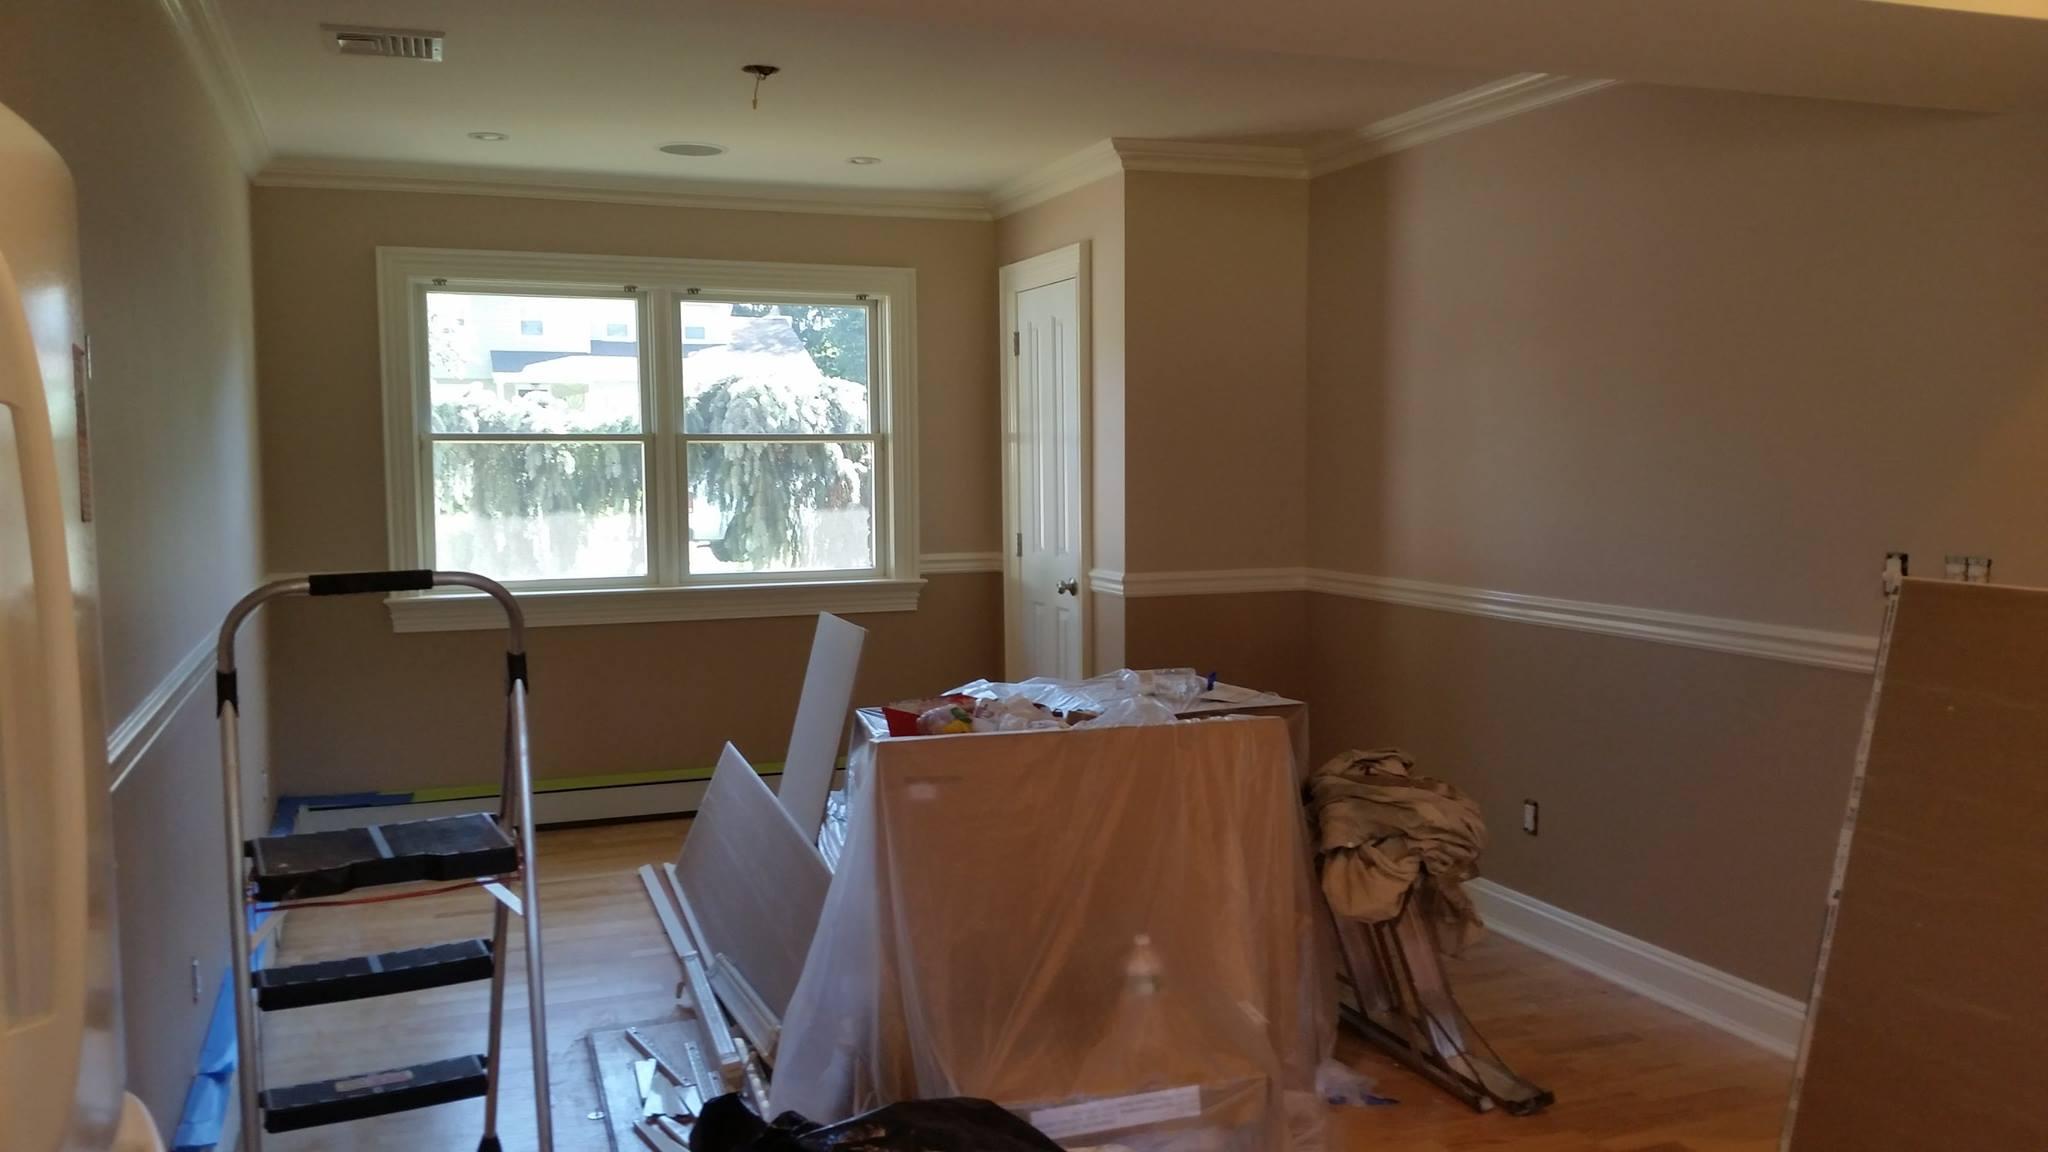 Painting service interiors mje professional painting for Professional painters cost interior